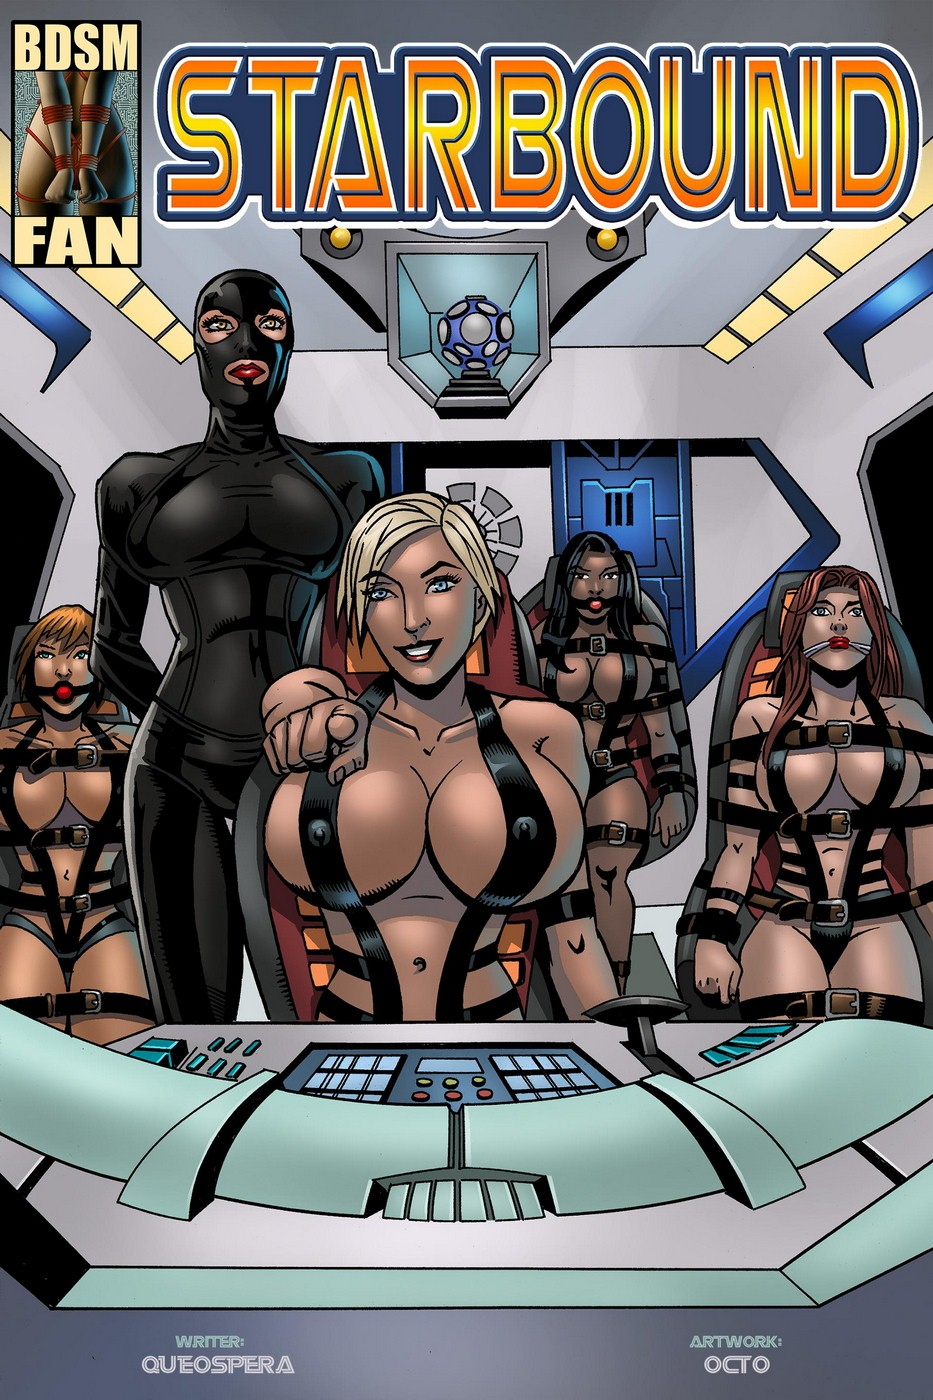 Free porn comic 🏆 PORN